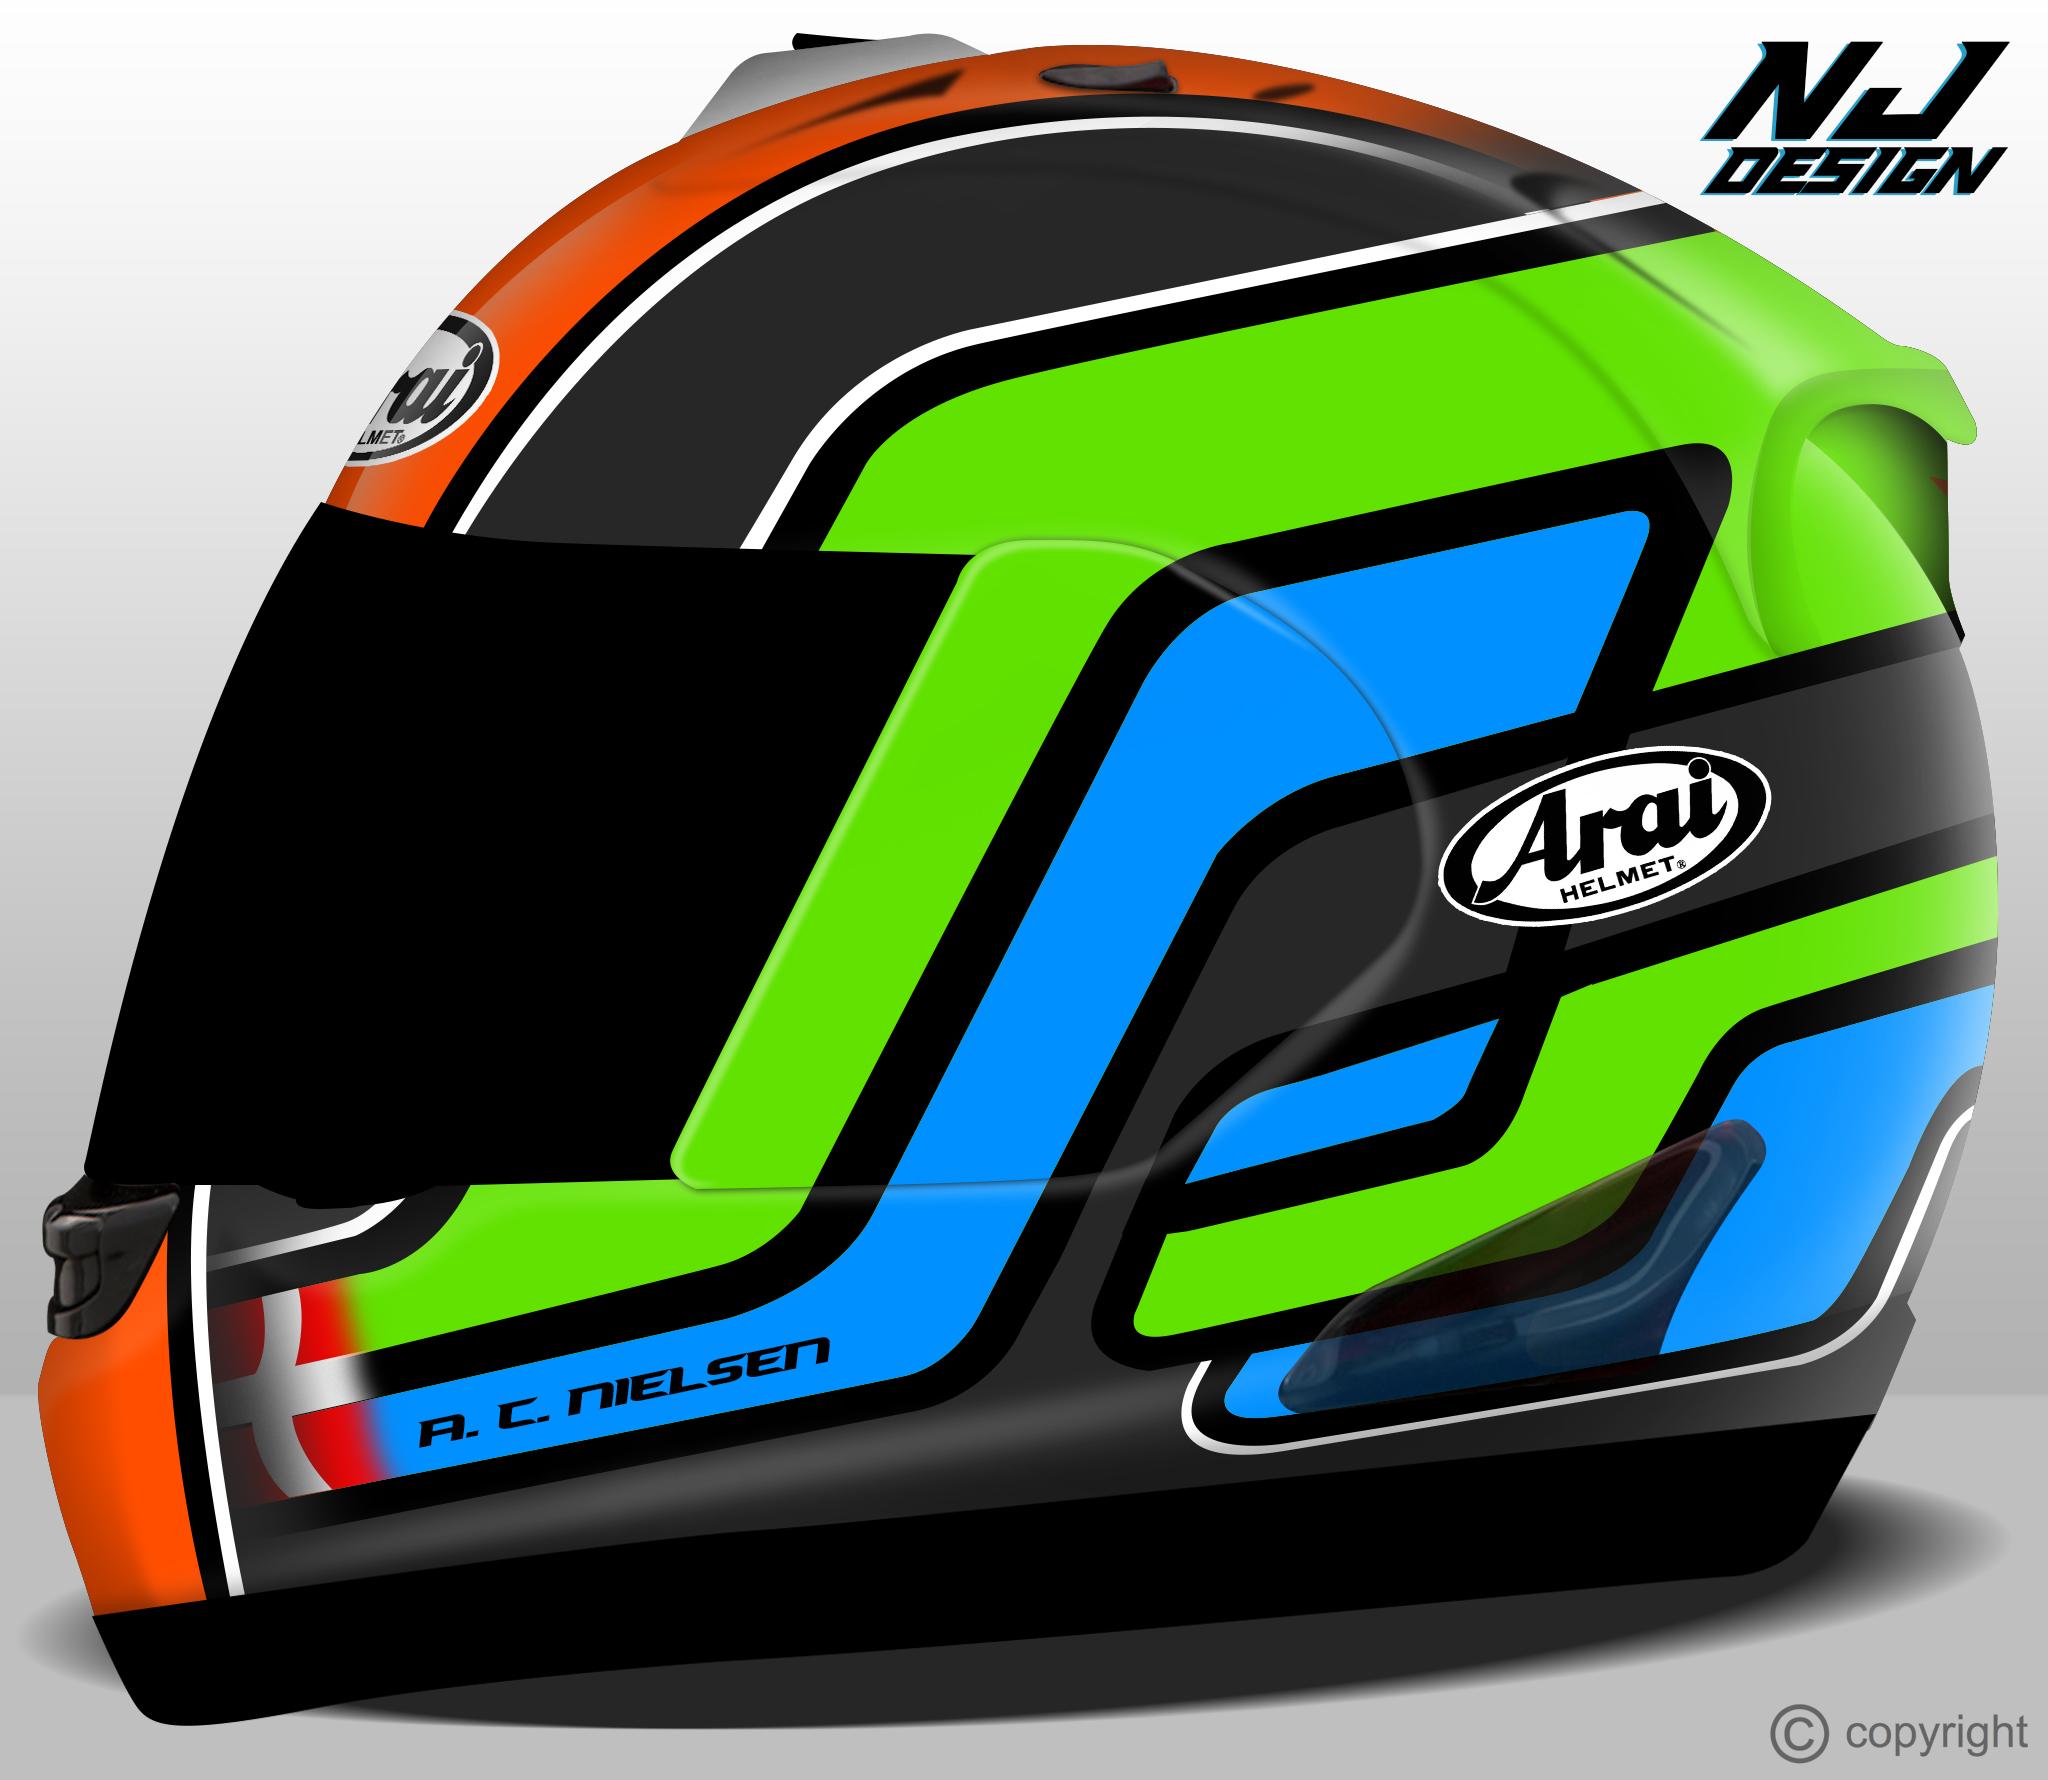 Helmet Designs 2014 NJ Design